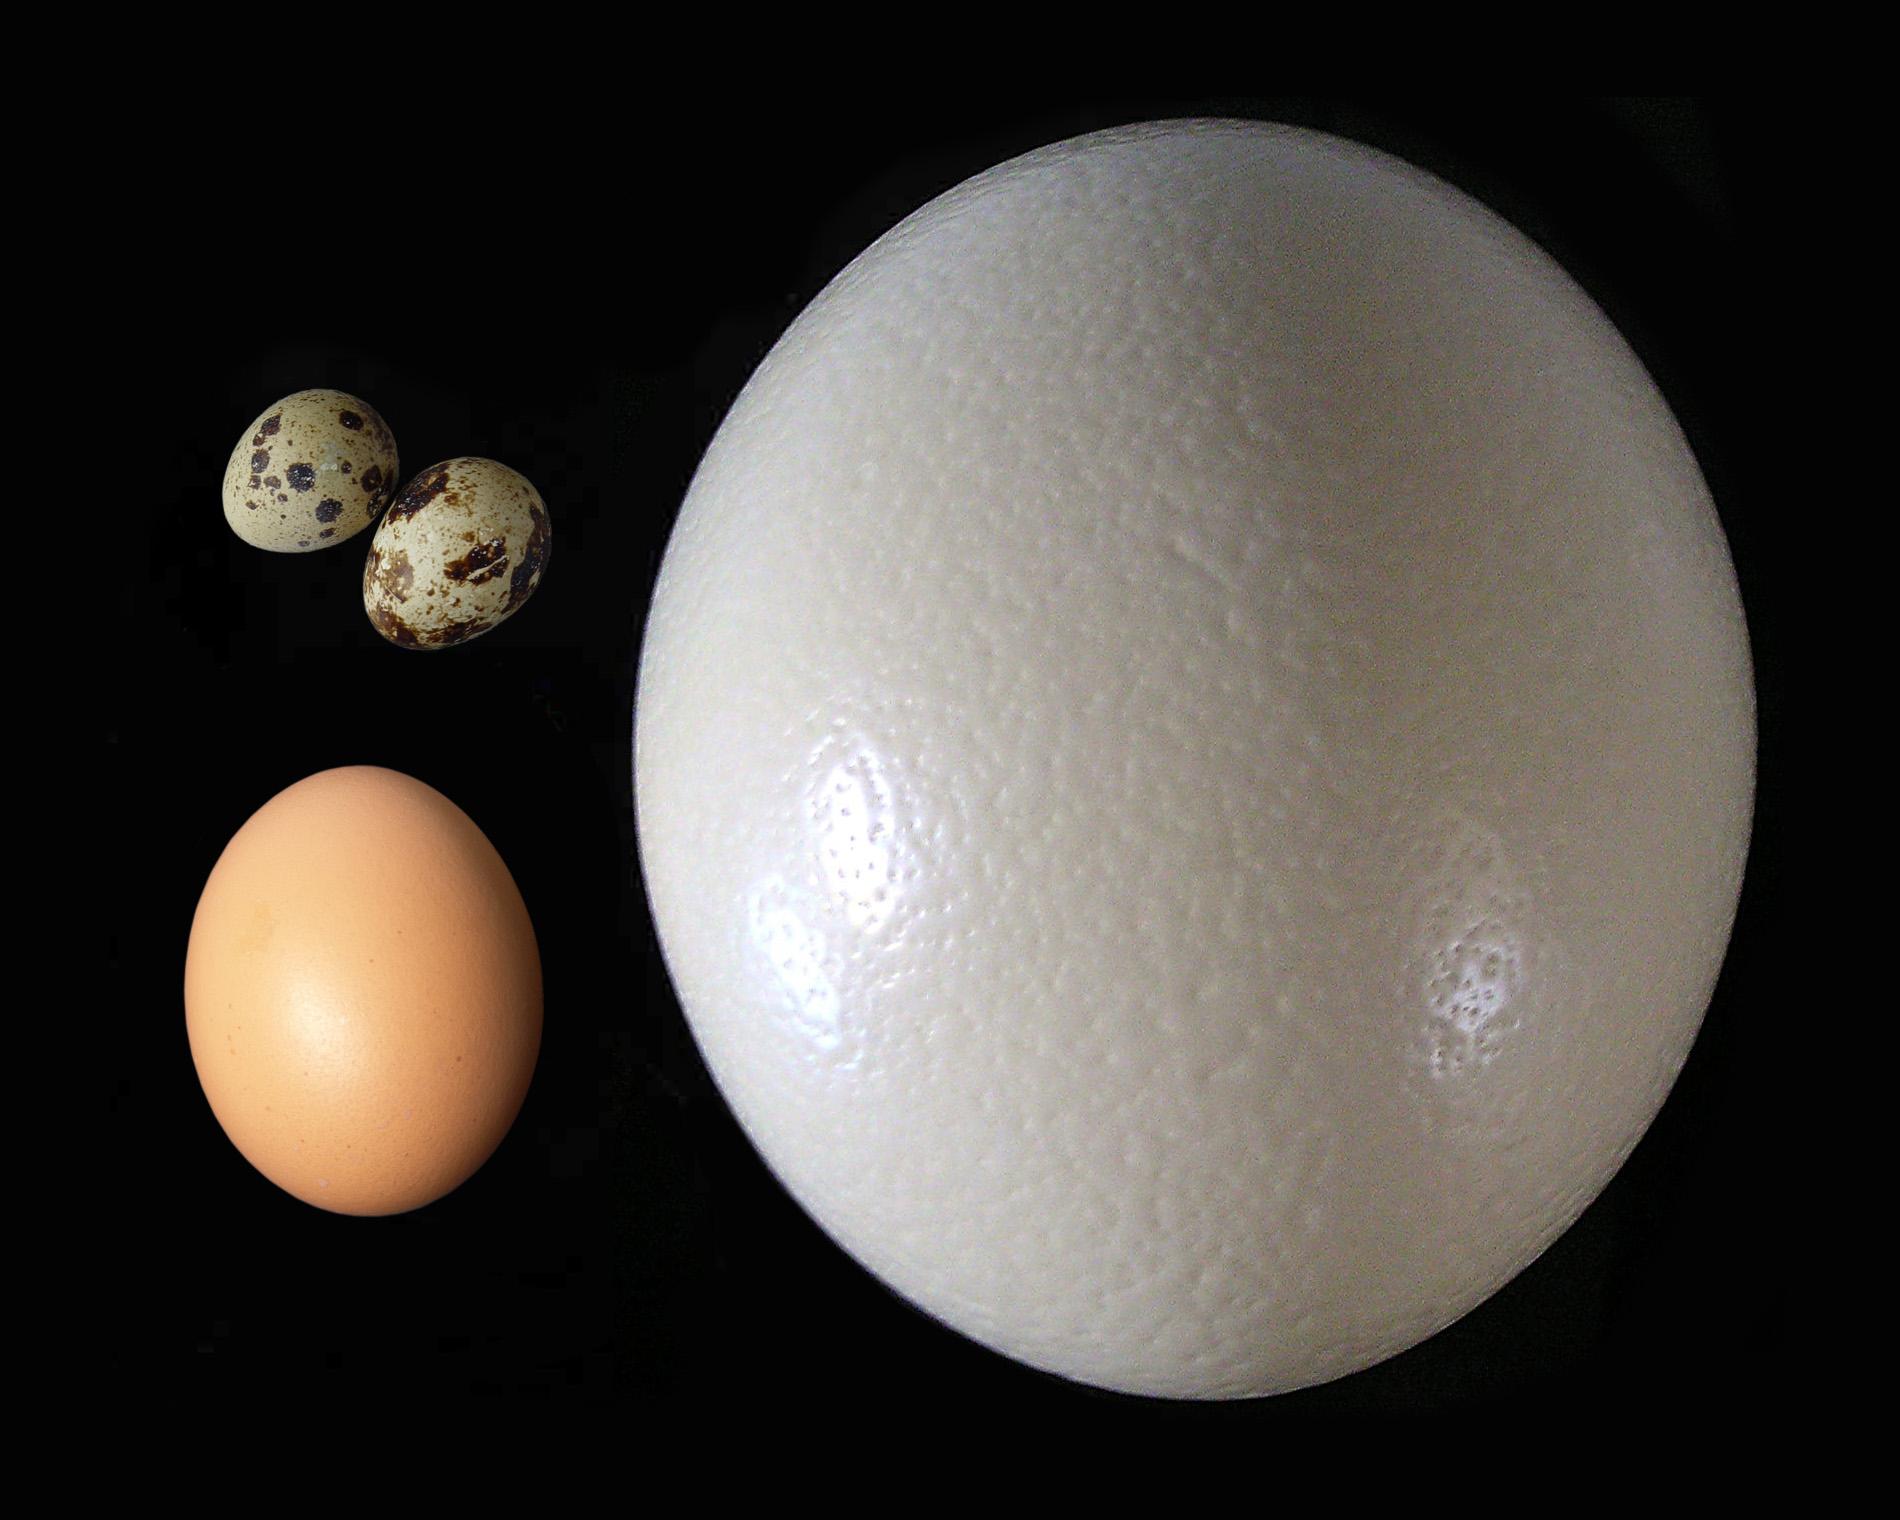 Egg (biology) - Simple English Wikipedia, the free encyclopedia